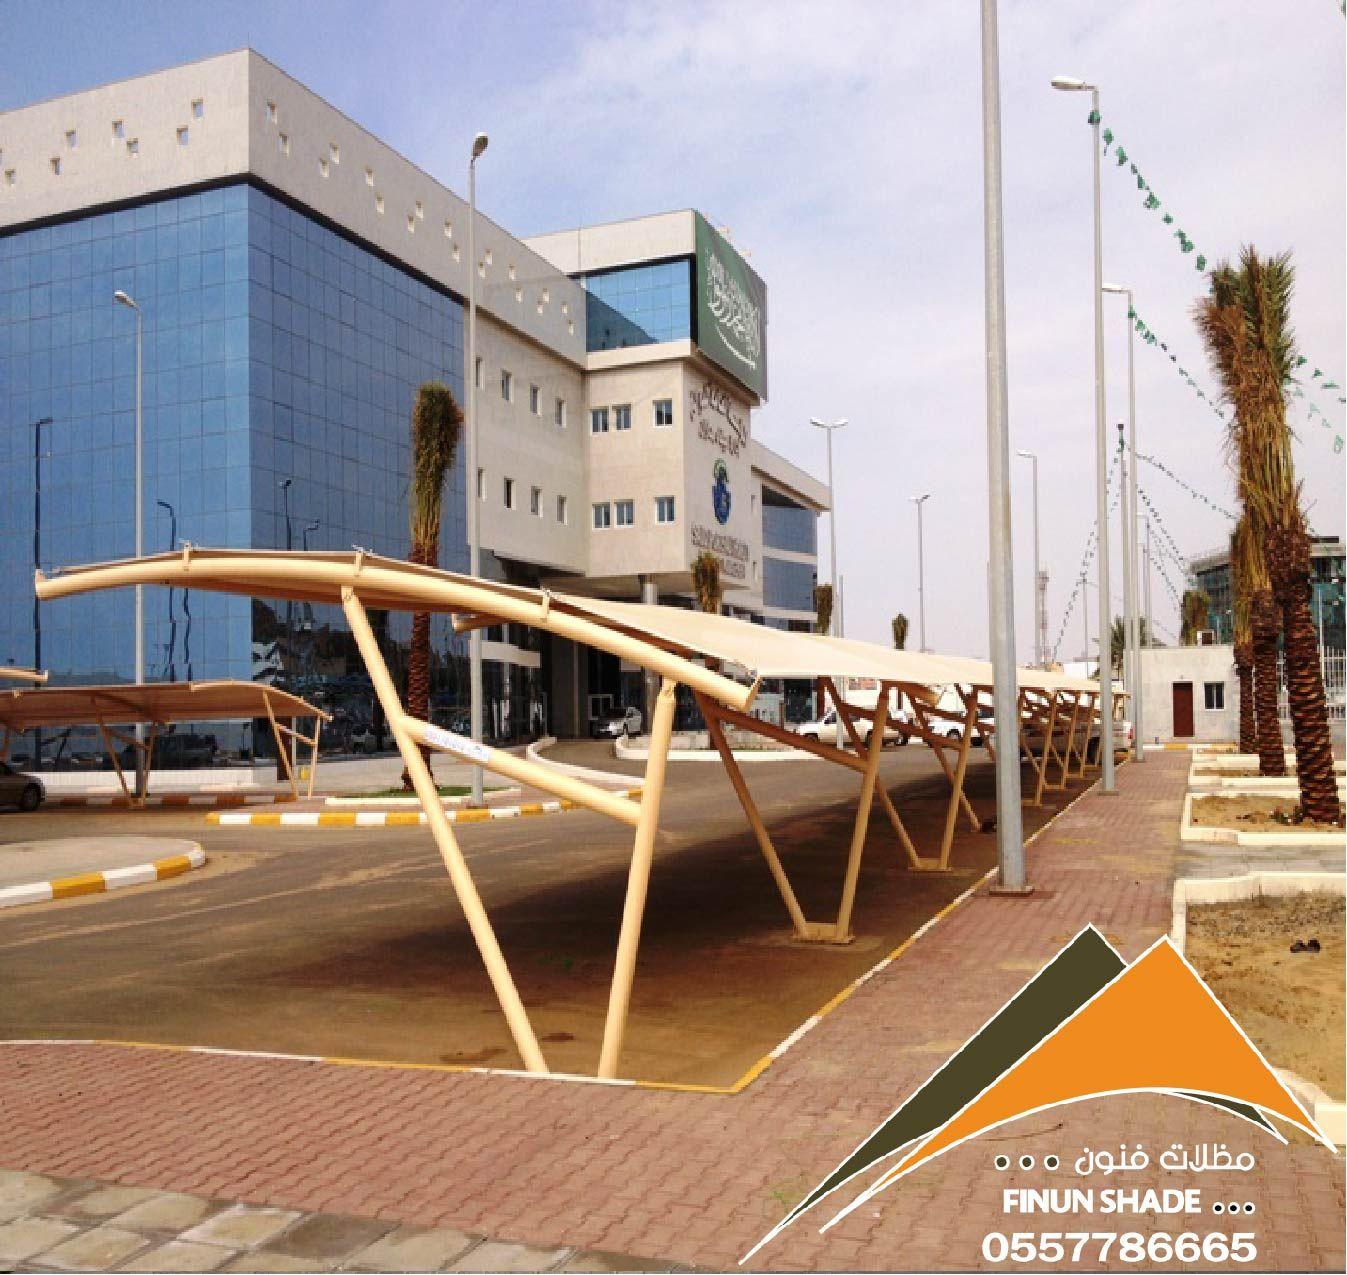 King Abdulaziz Historical Center Riyadh Flight Offers Travel Inspiration